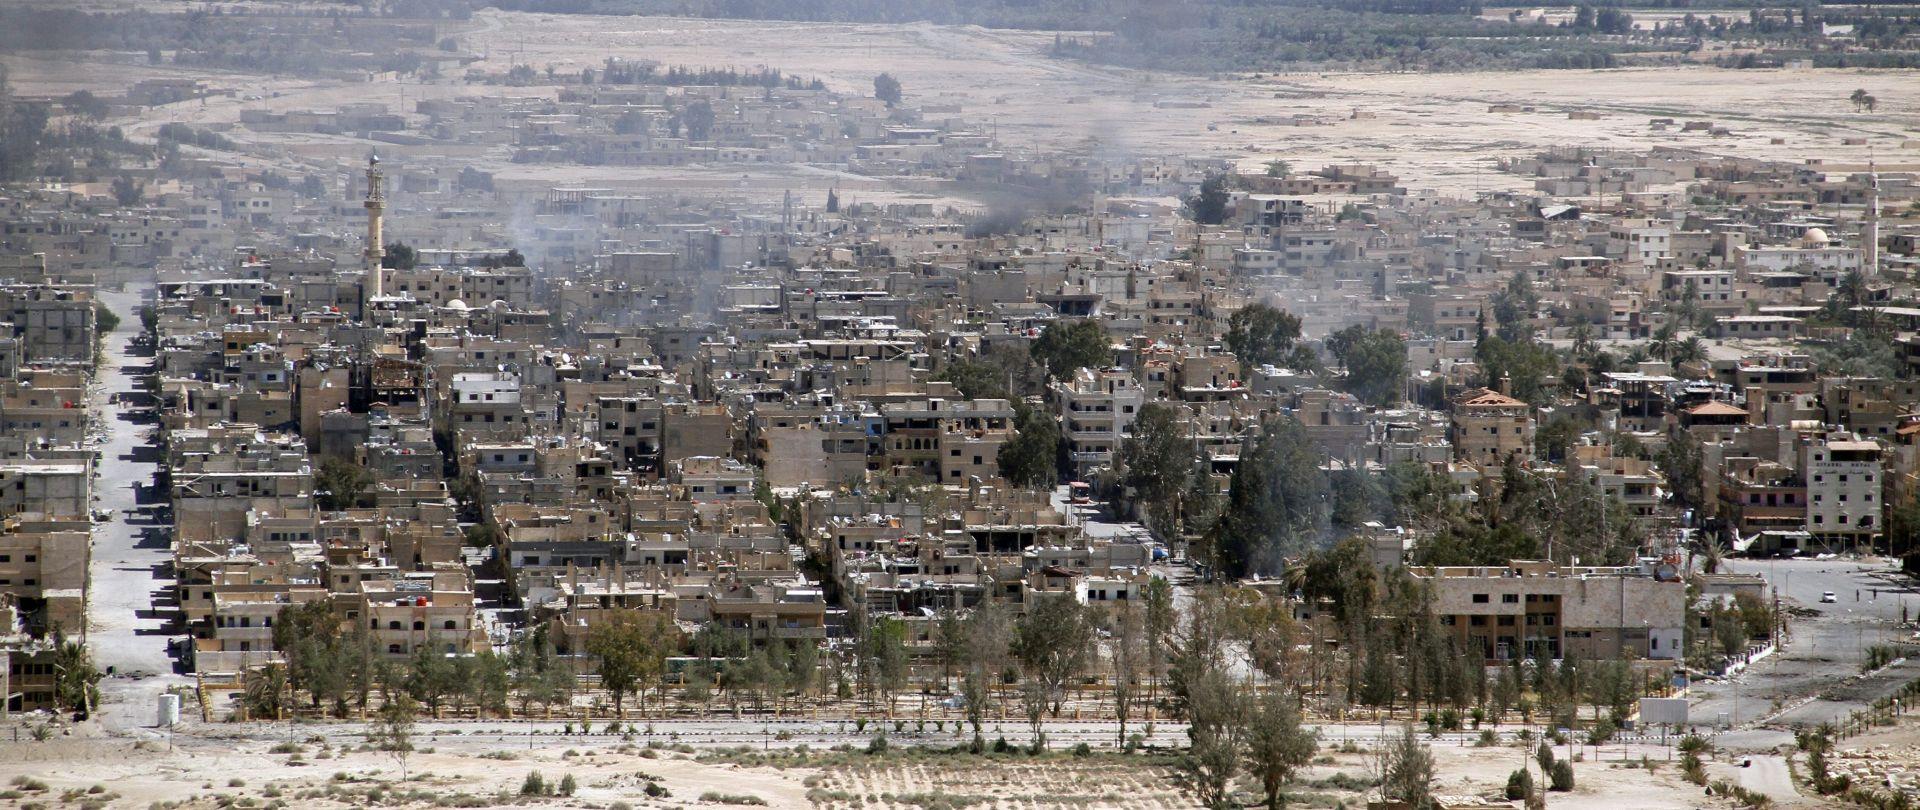 Ruski zračni napadi istjerali borce Islamske države iz Palmire